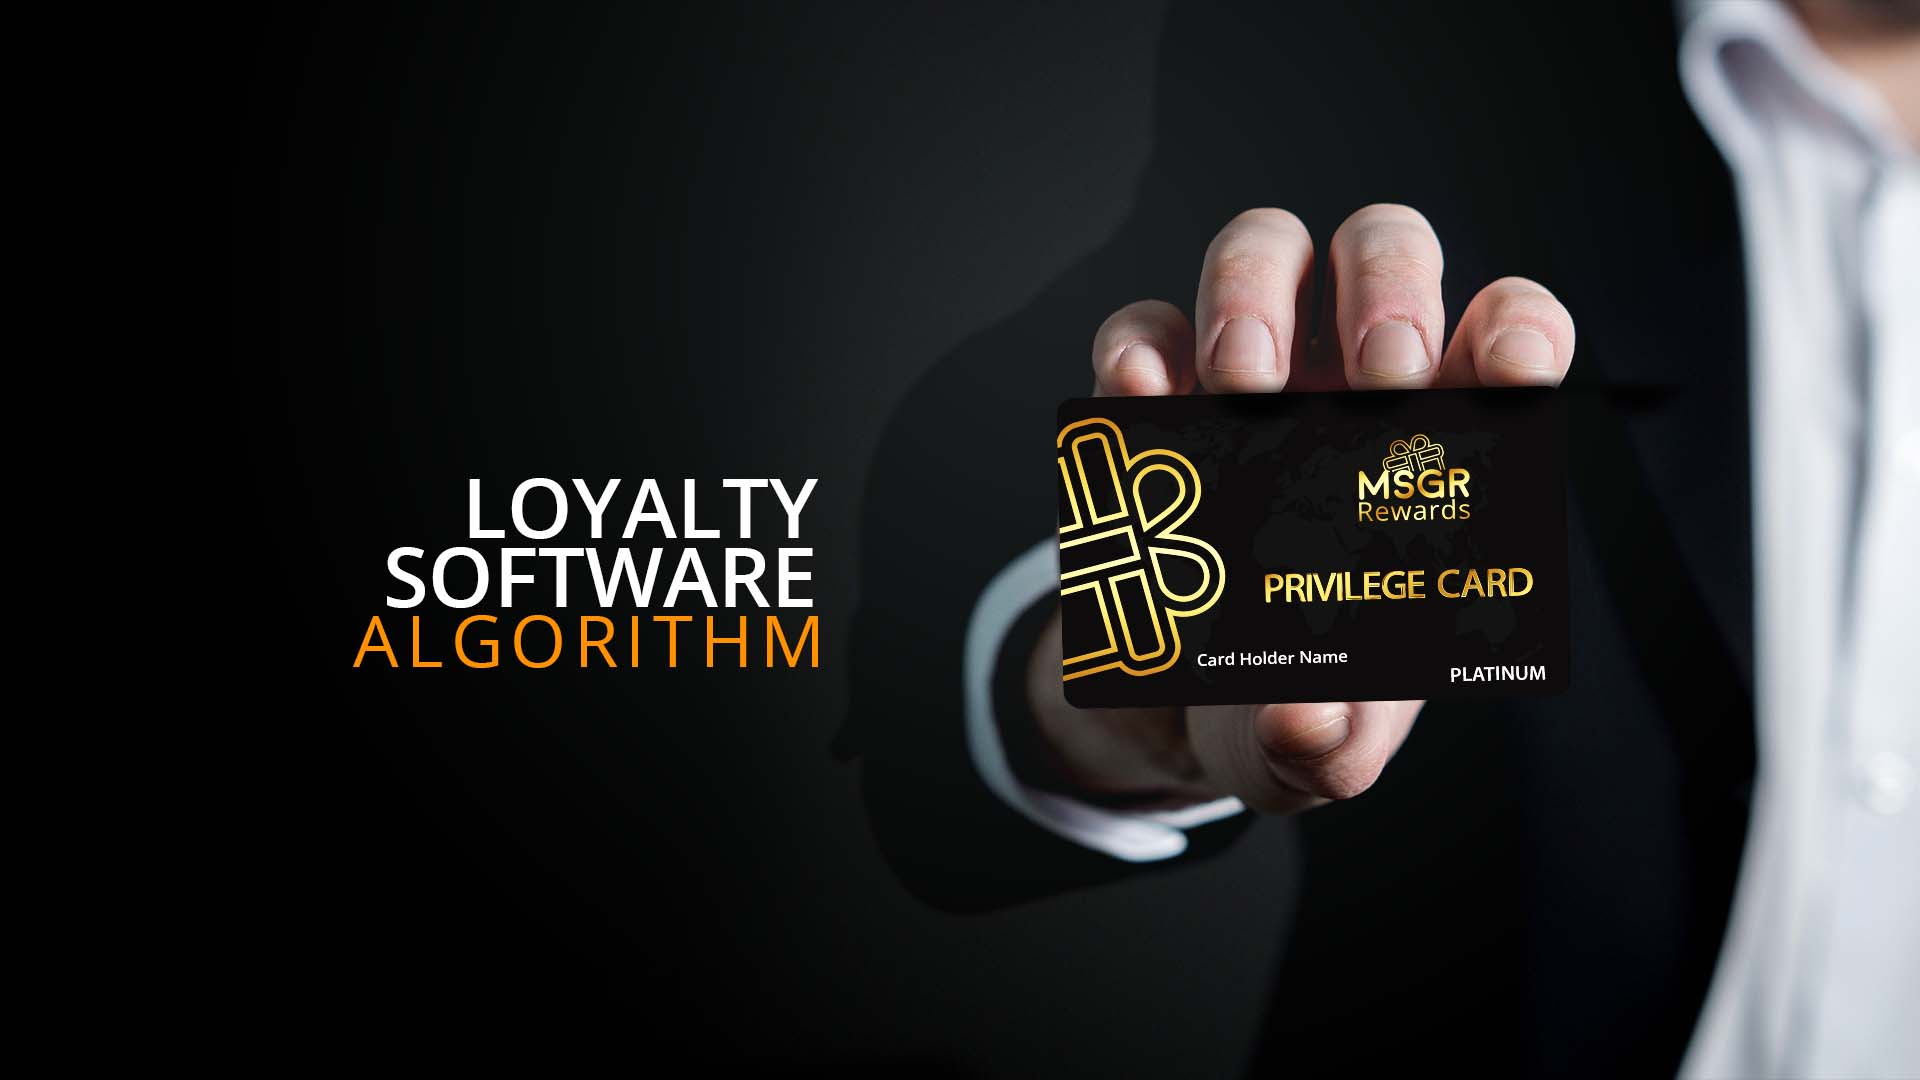 Loyalty Software